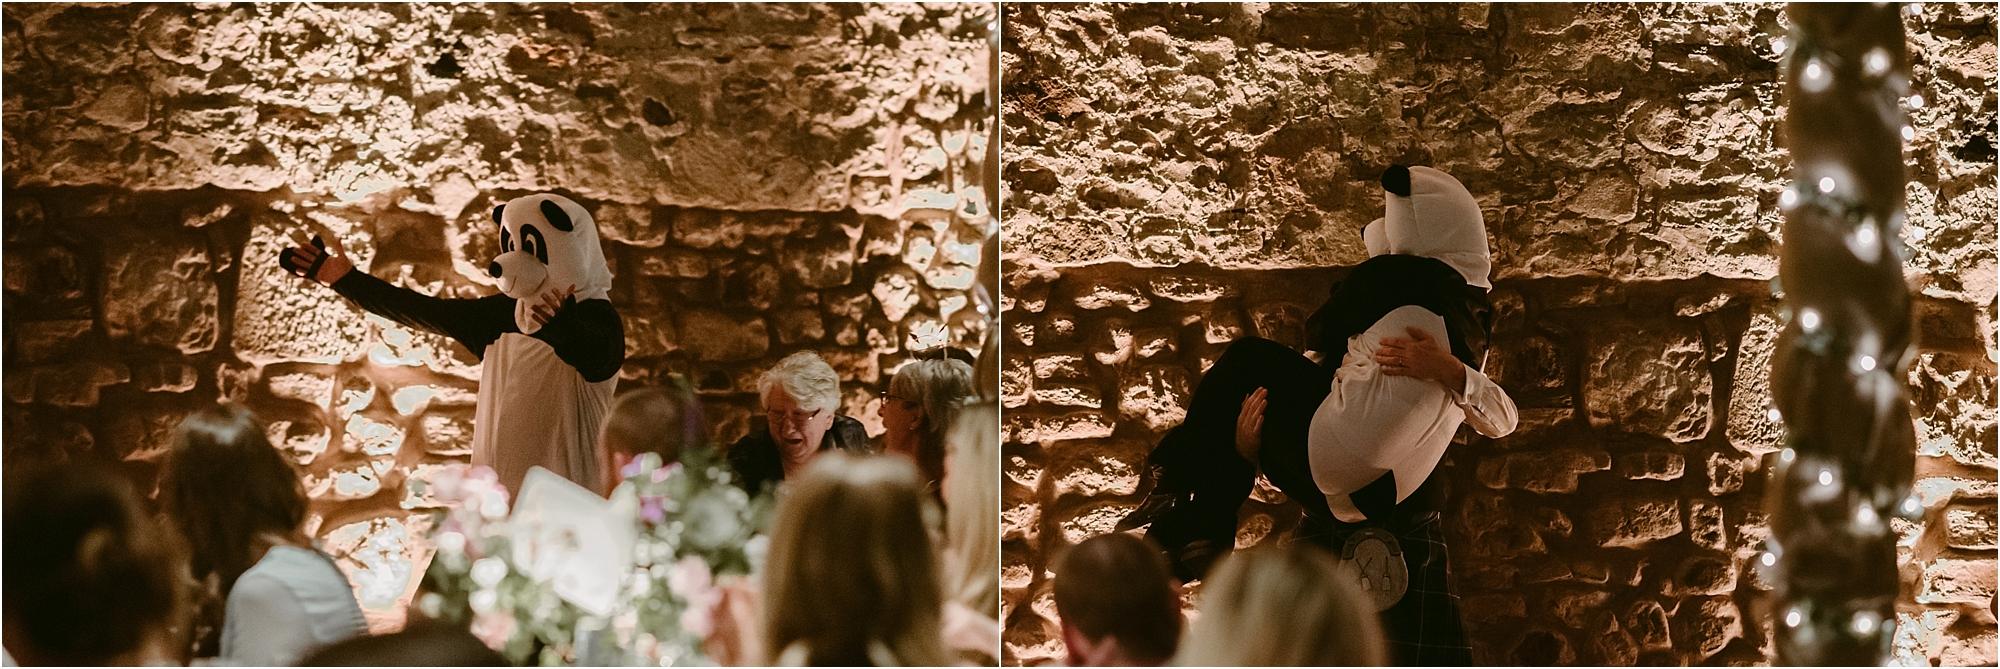 Scott+Joanna-Kinkell-Byre-wedding-fife-photography__0091.jpg